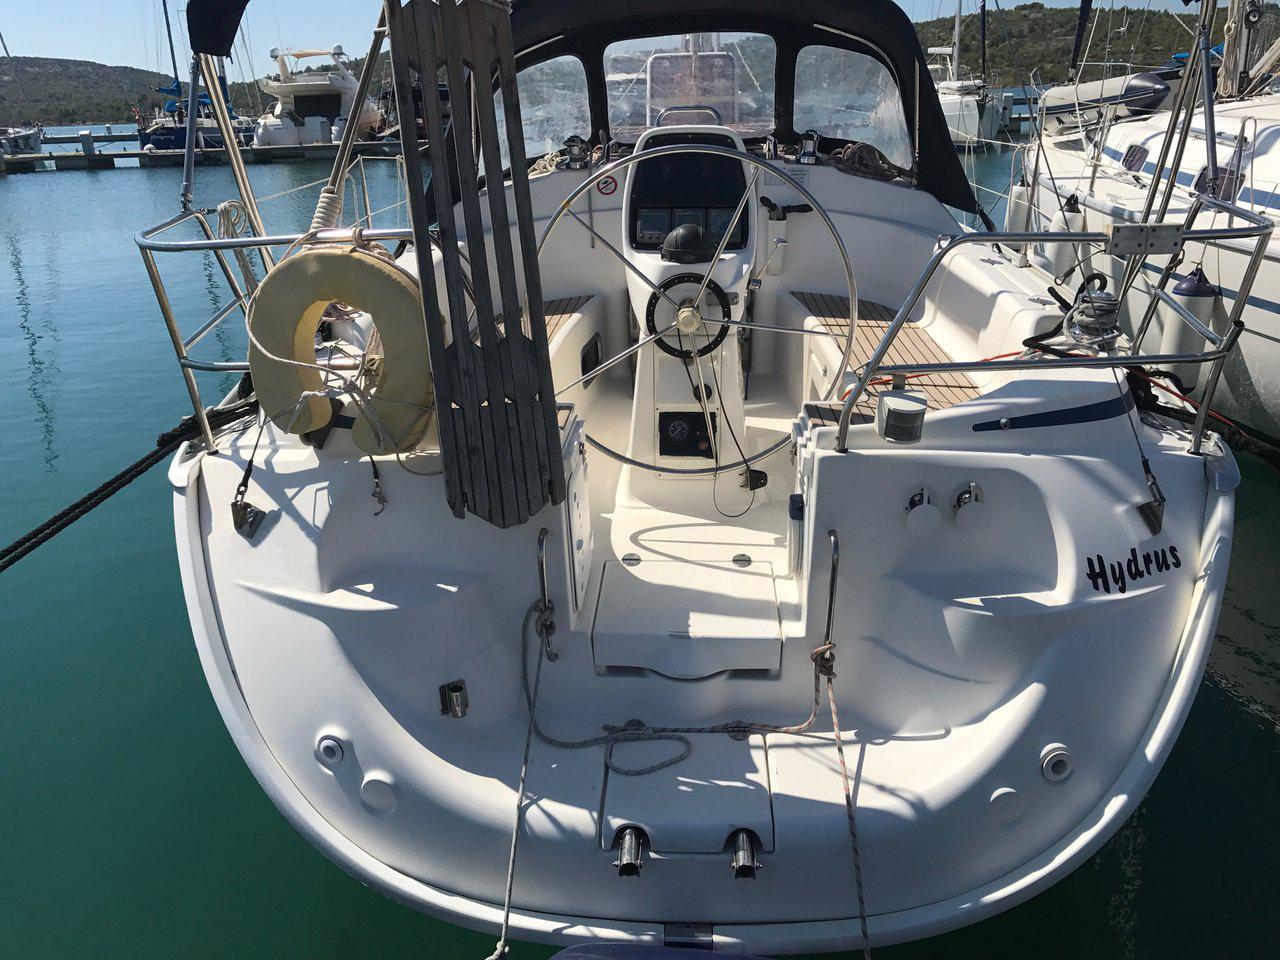 Bavaria 33 Cruiser - HYDRUS